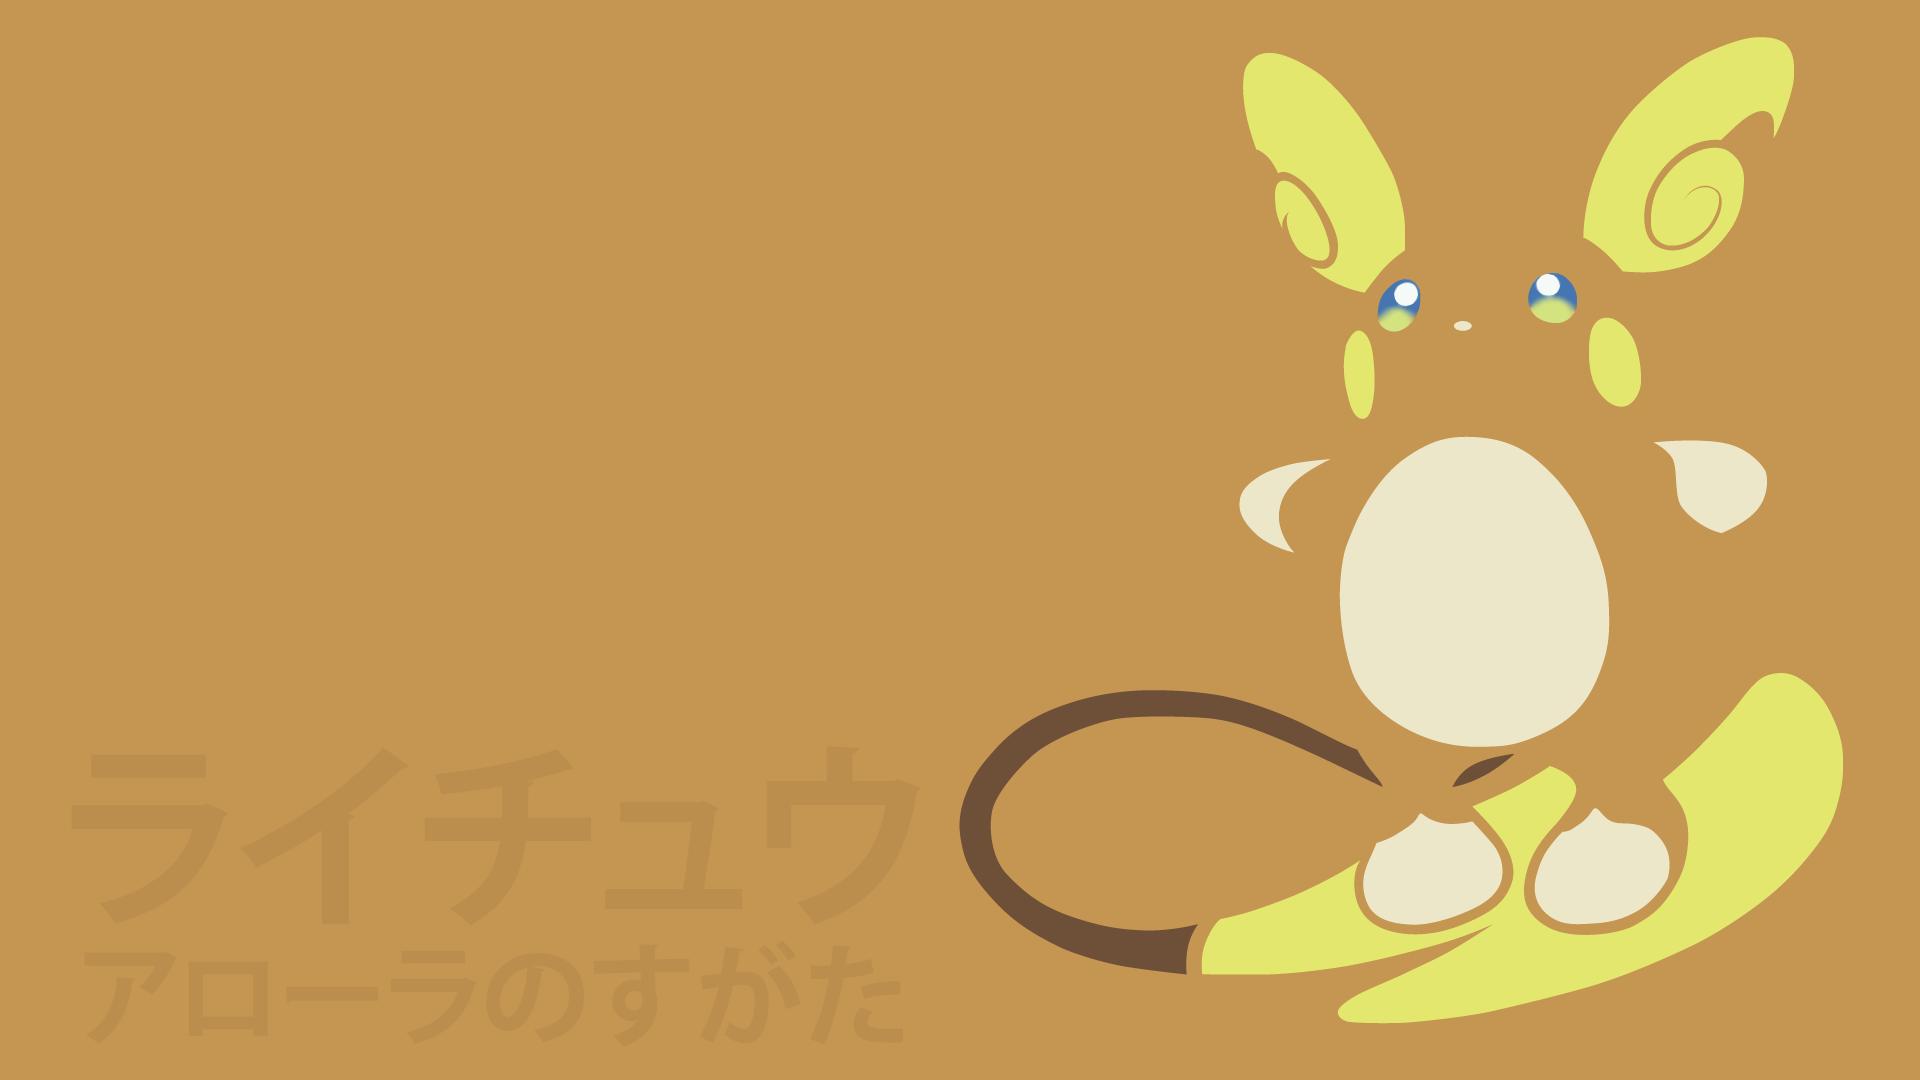 Pokemon Raichu Wallpaper Images